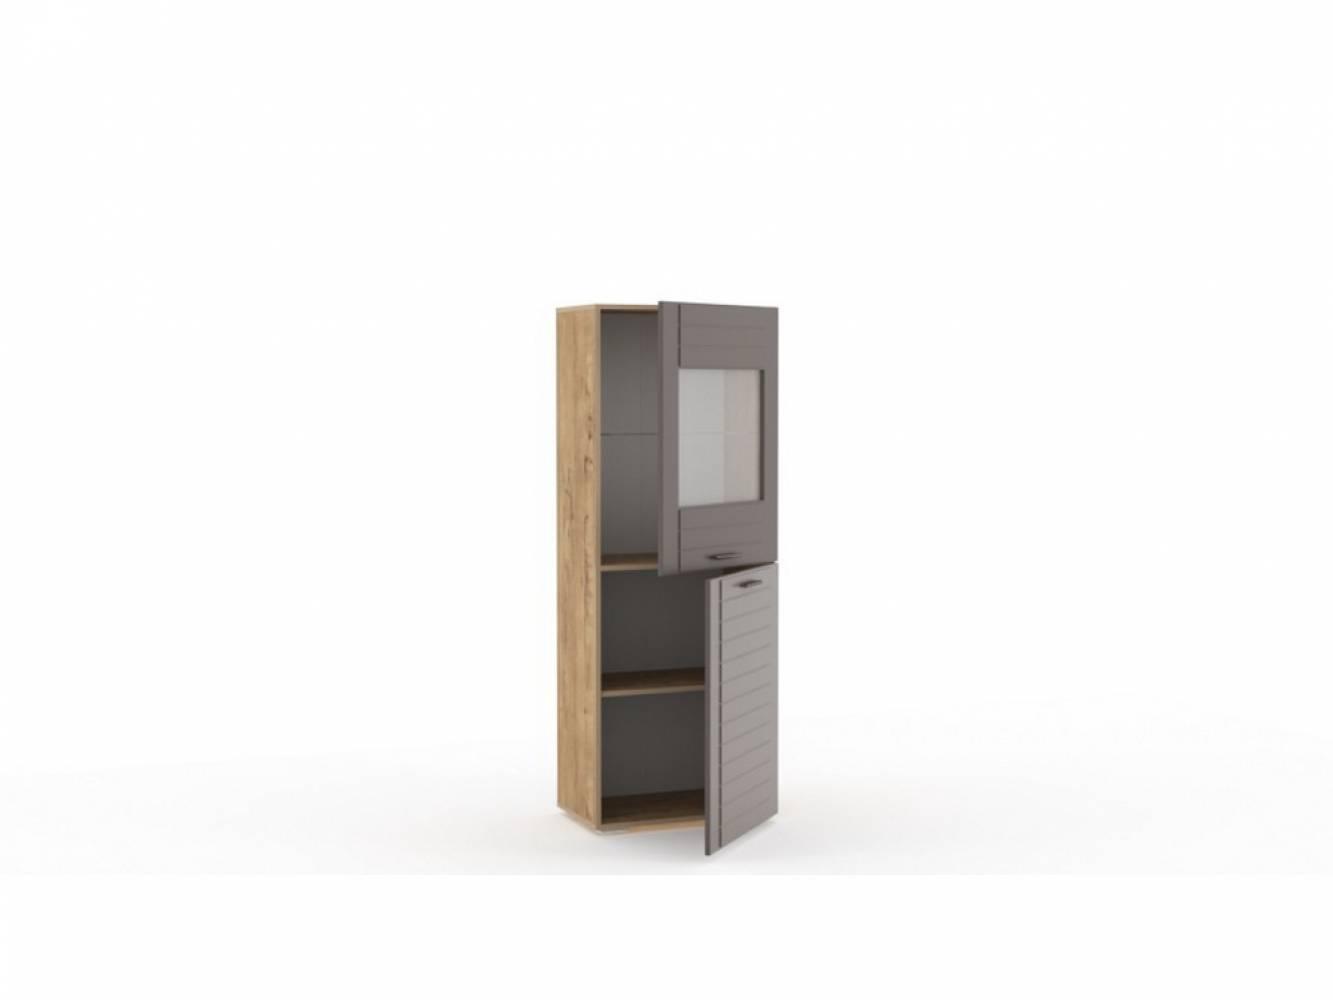 Шкаф комбинированный НМ 011.49-01 LIVORNO (Дуб Бунратти/Софт Графит)